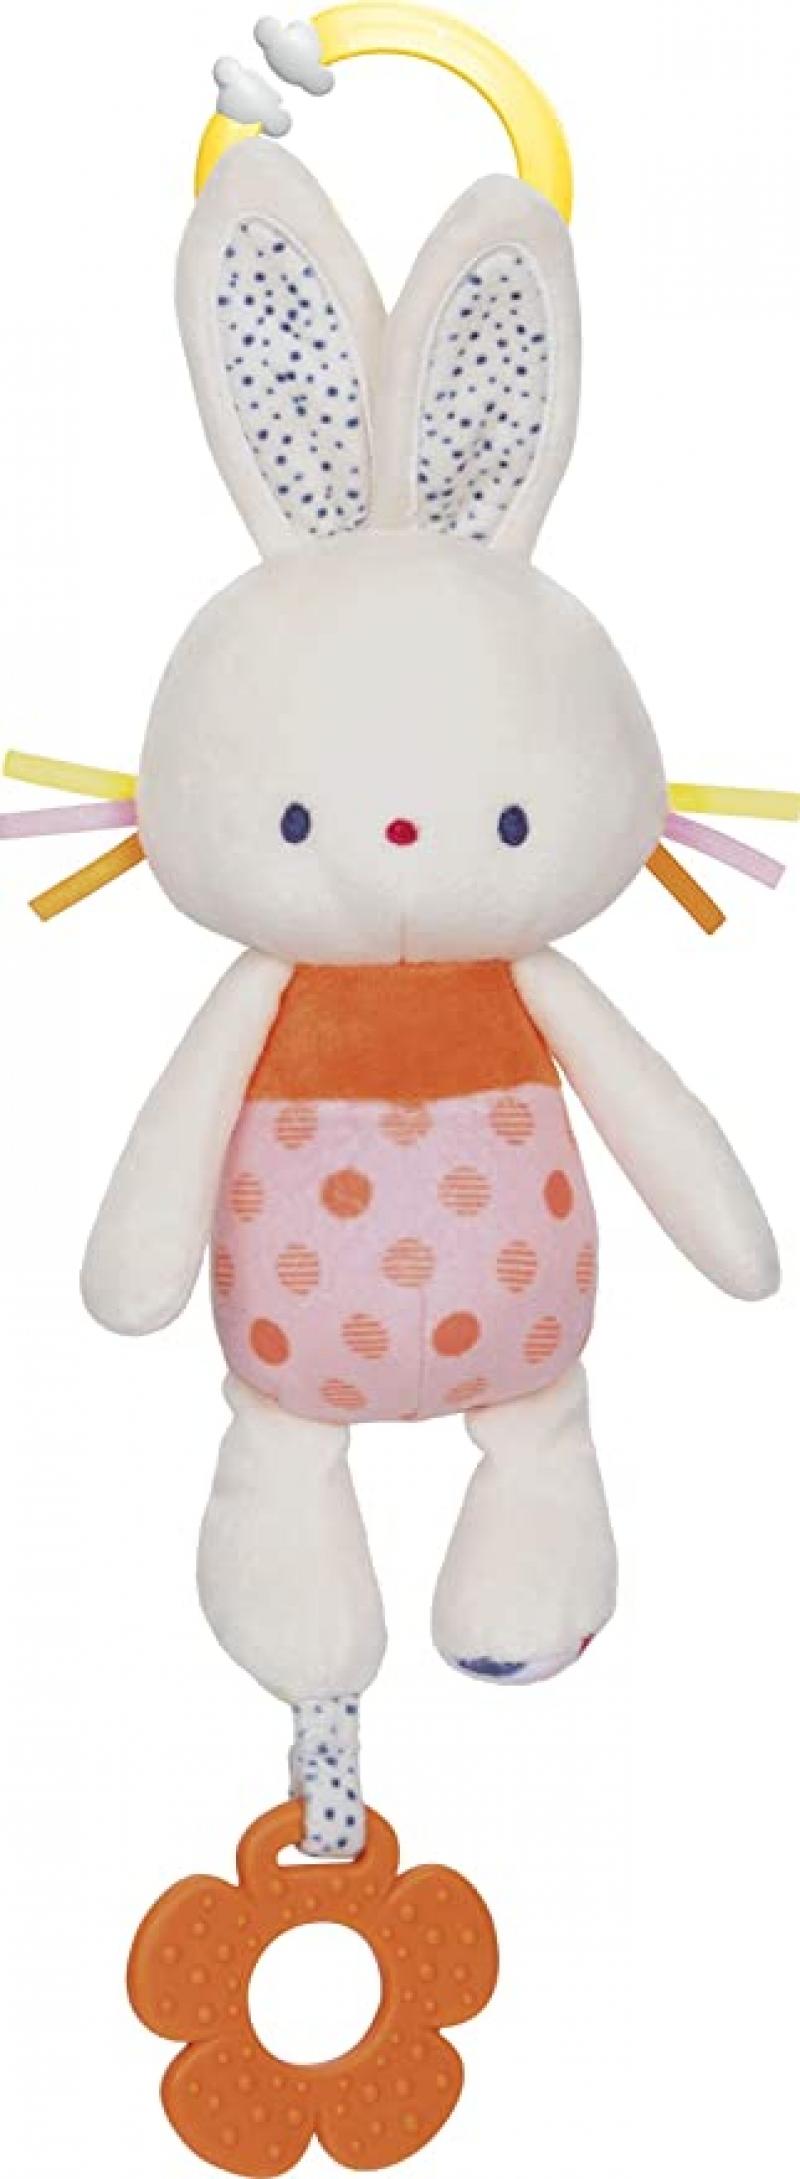 ihocon: 嬰兒玩具 - Baby GUND Tinkle Crinkle Activity Plush Bunny Stuffed Animal, 13吋